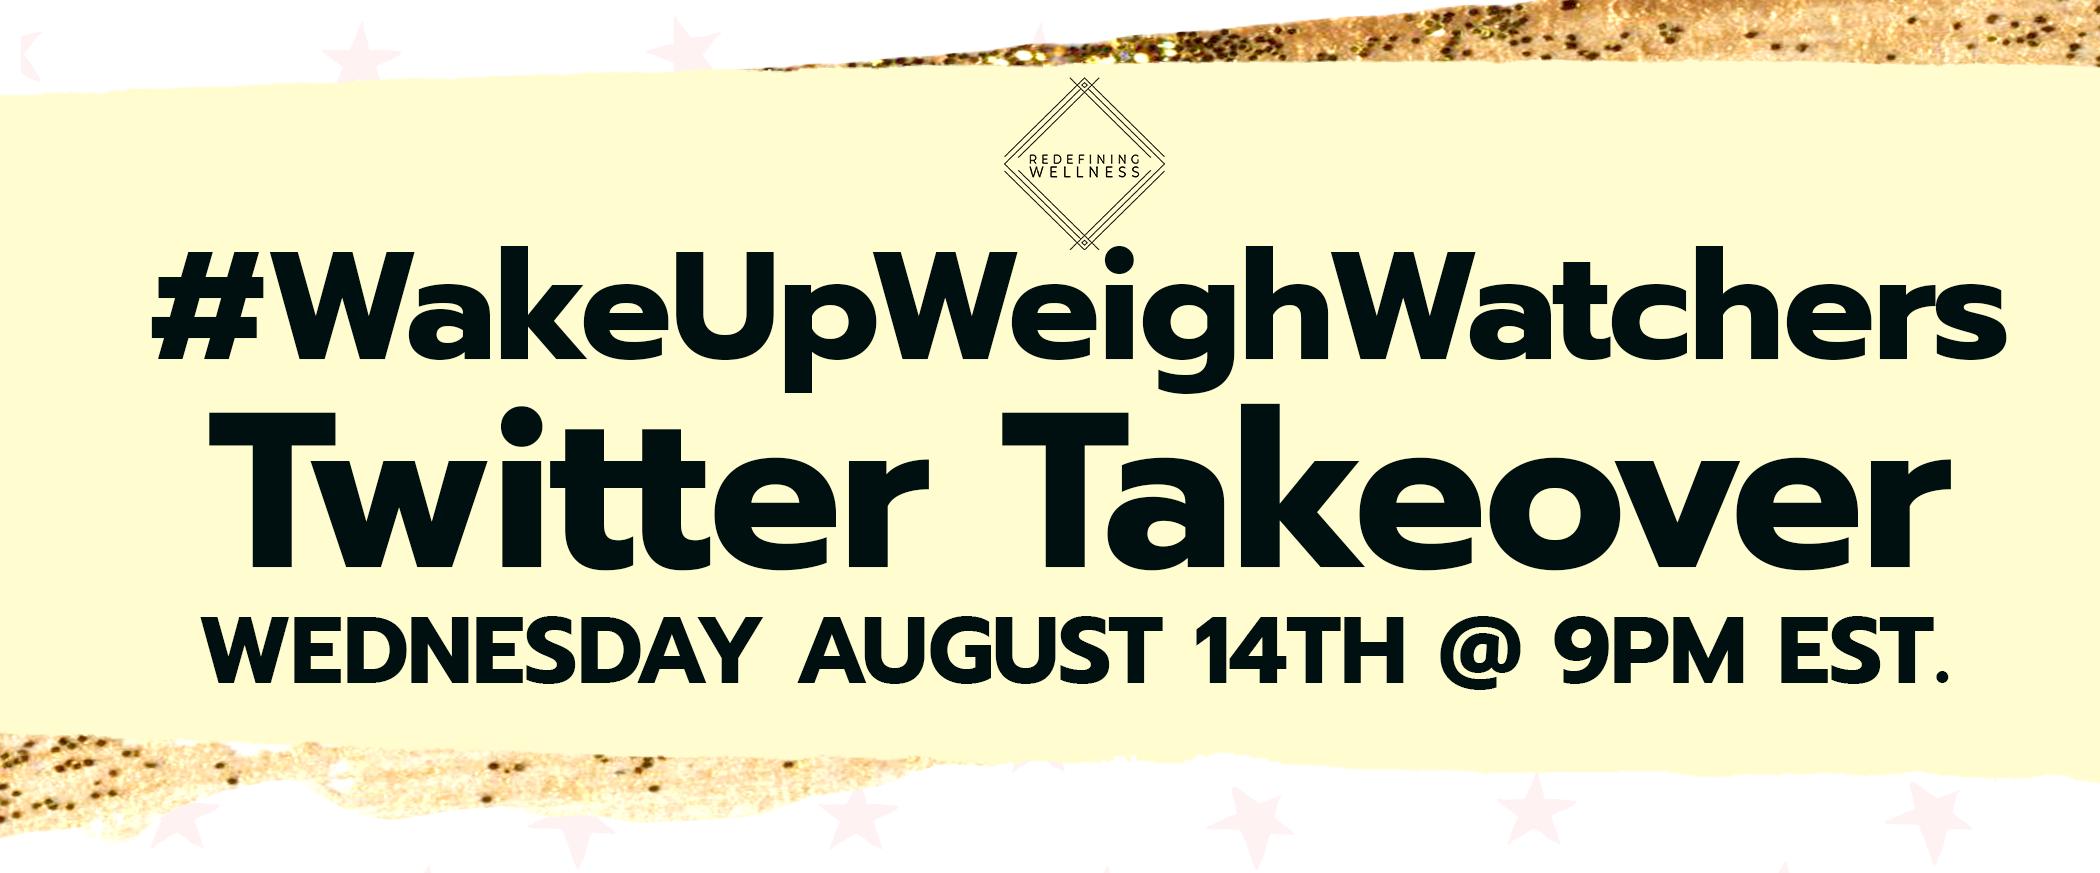 Redefining Wellness WakeUpWeightWatchers Twitter Takeover Kurbo Kids App